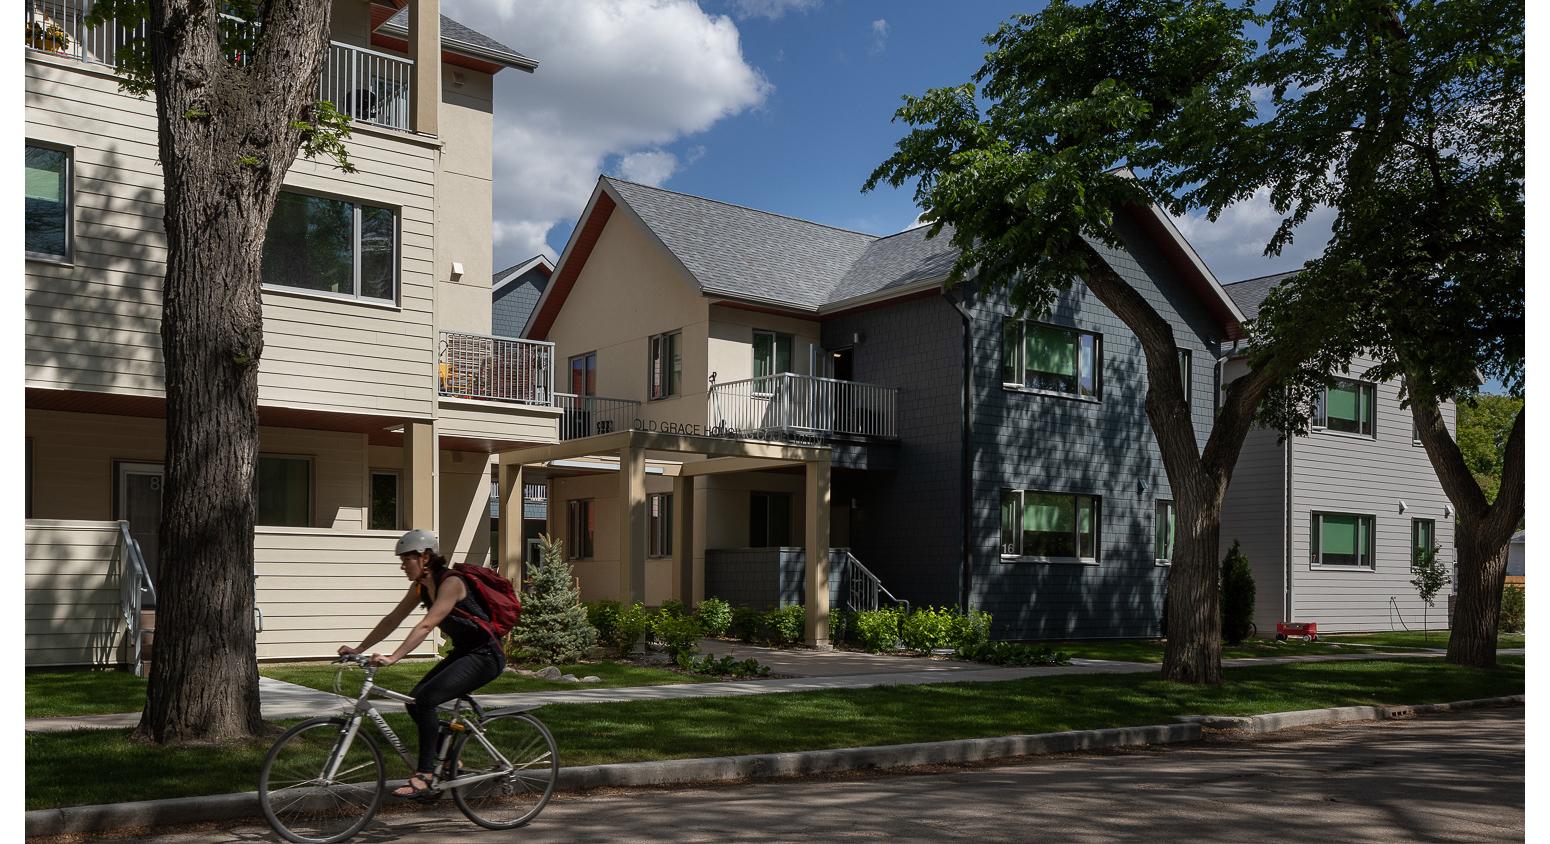 Old-Grace-Housing-Coop-ext-evanson-entry.jpg